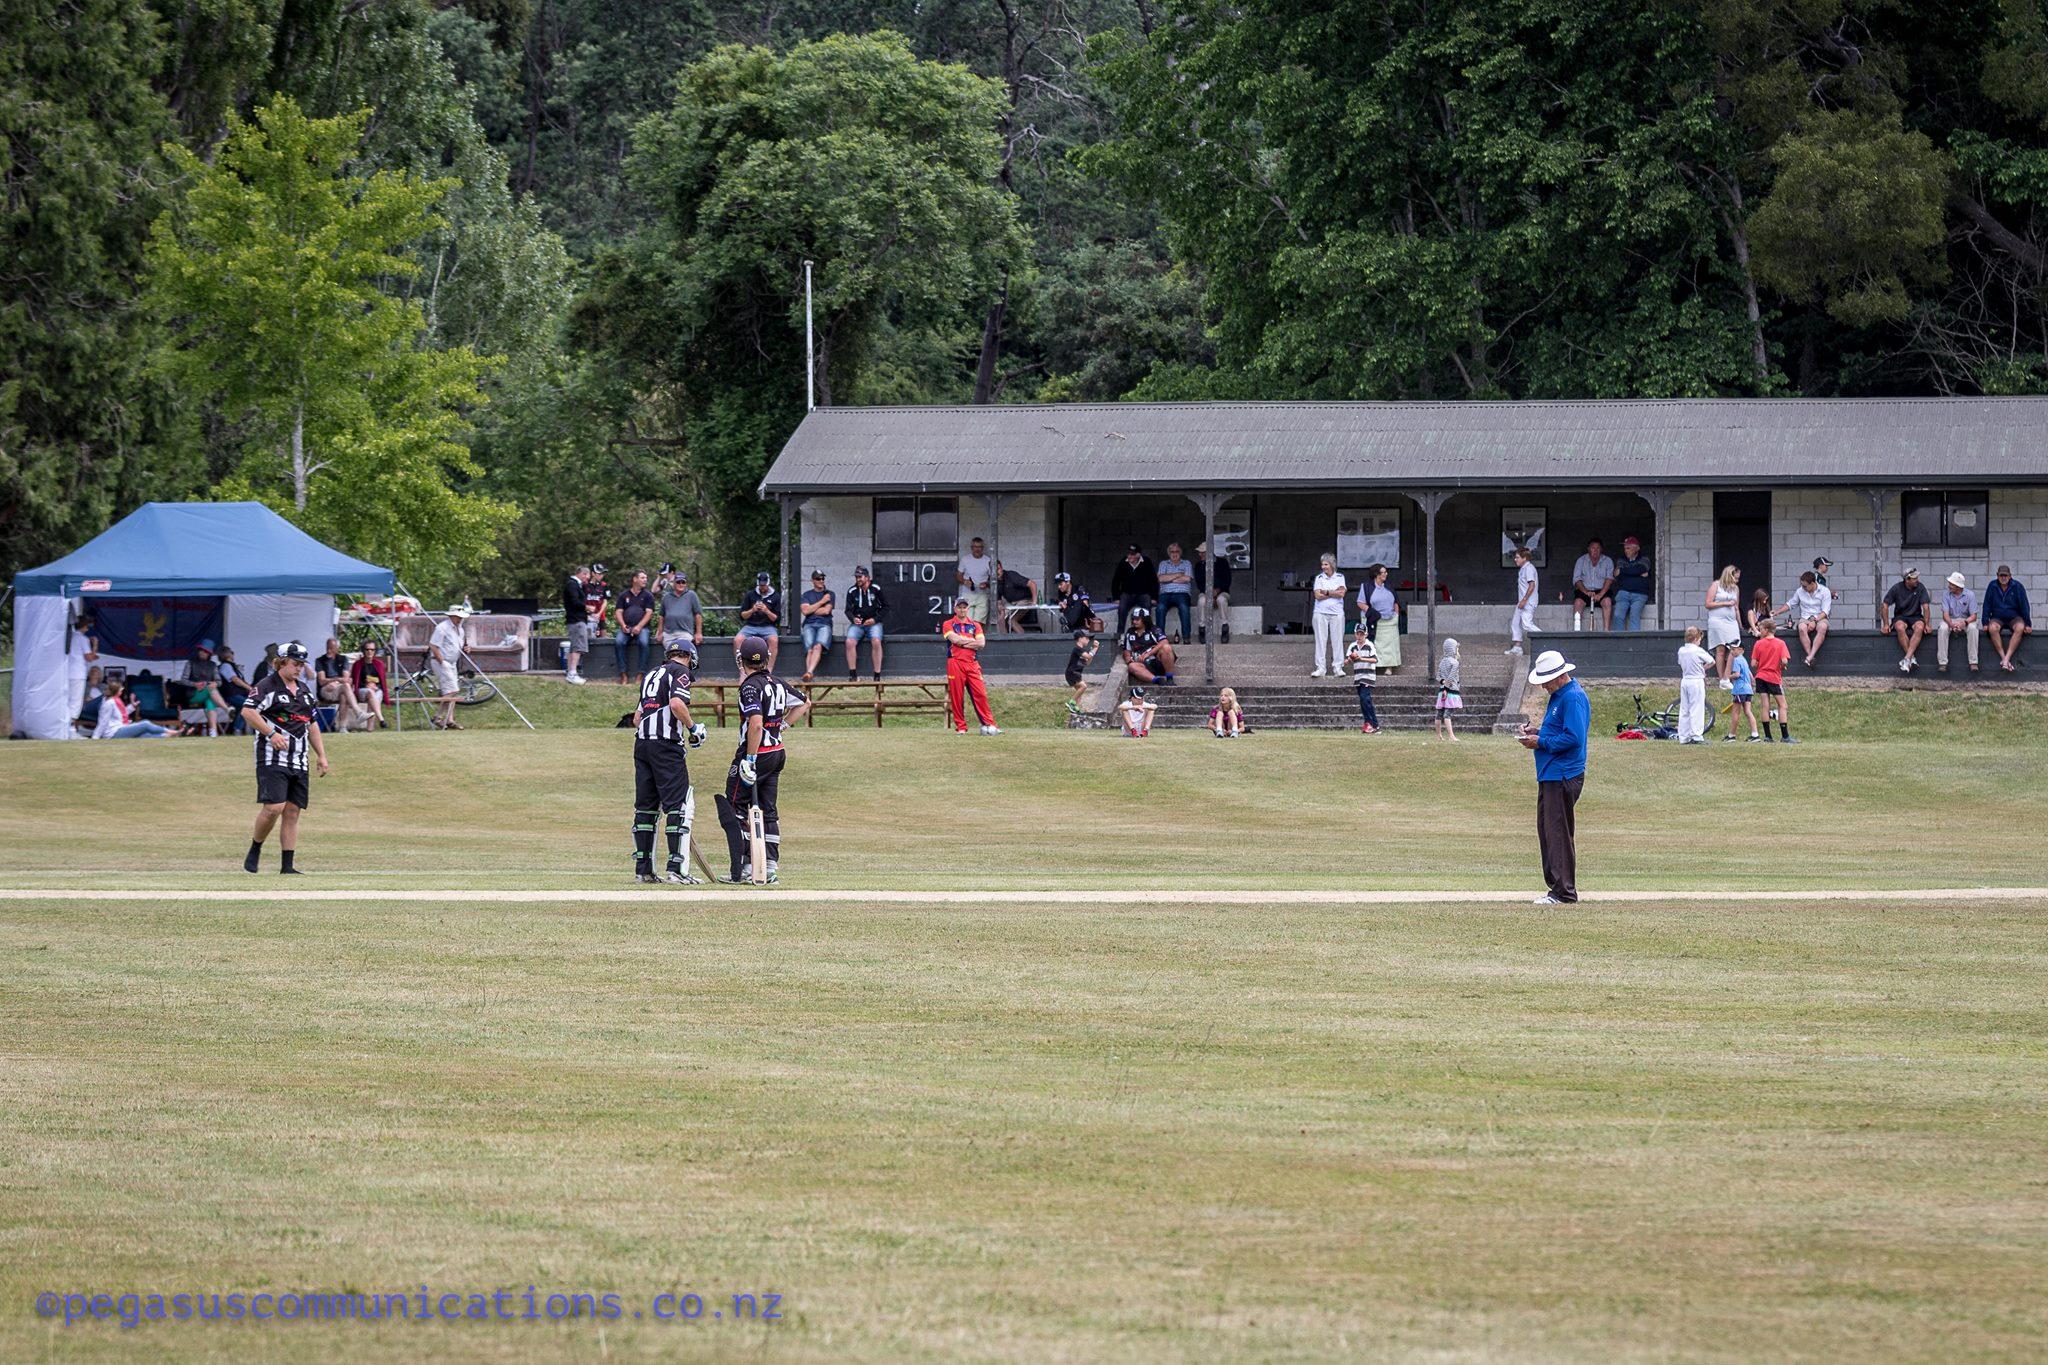 Cheviot Cricket Club